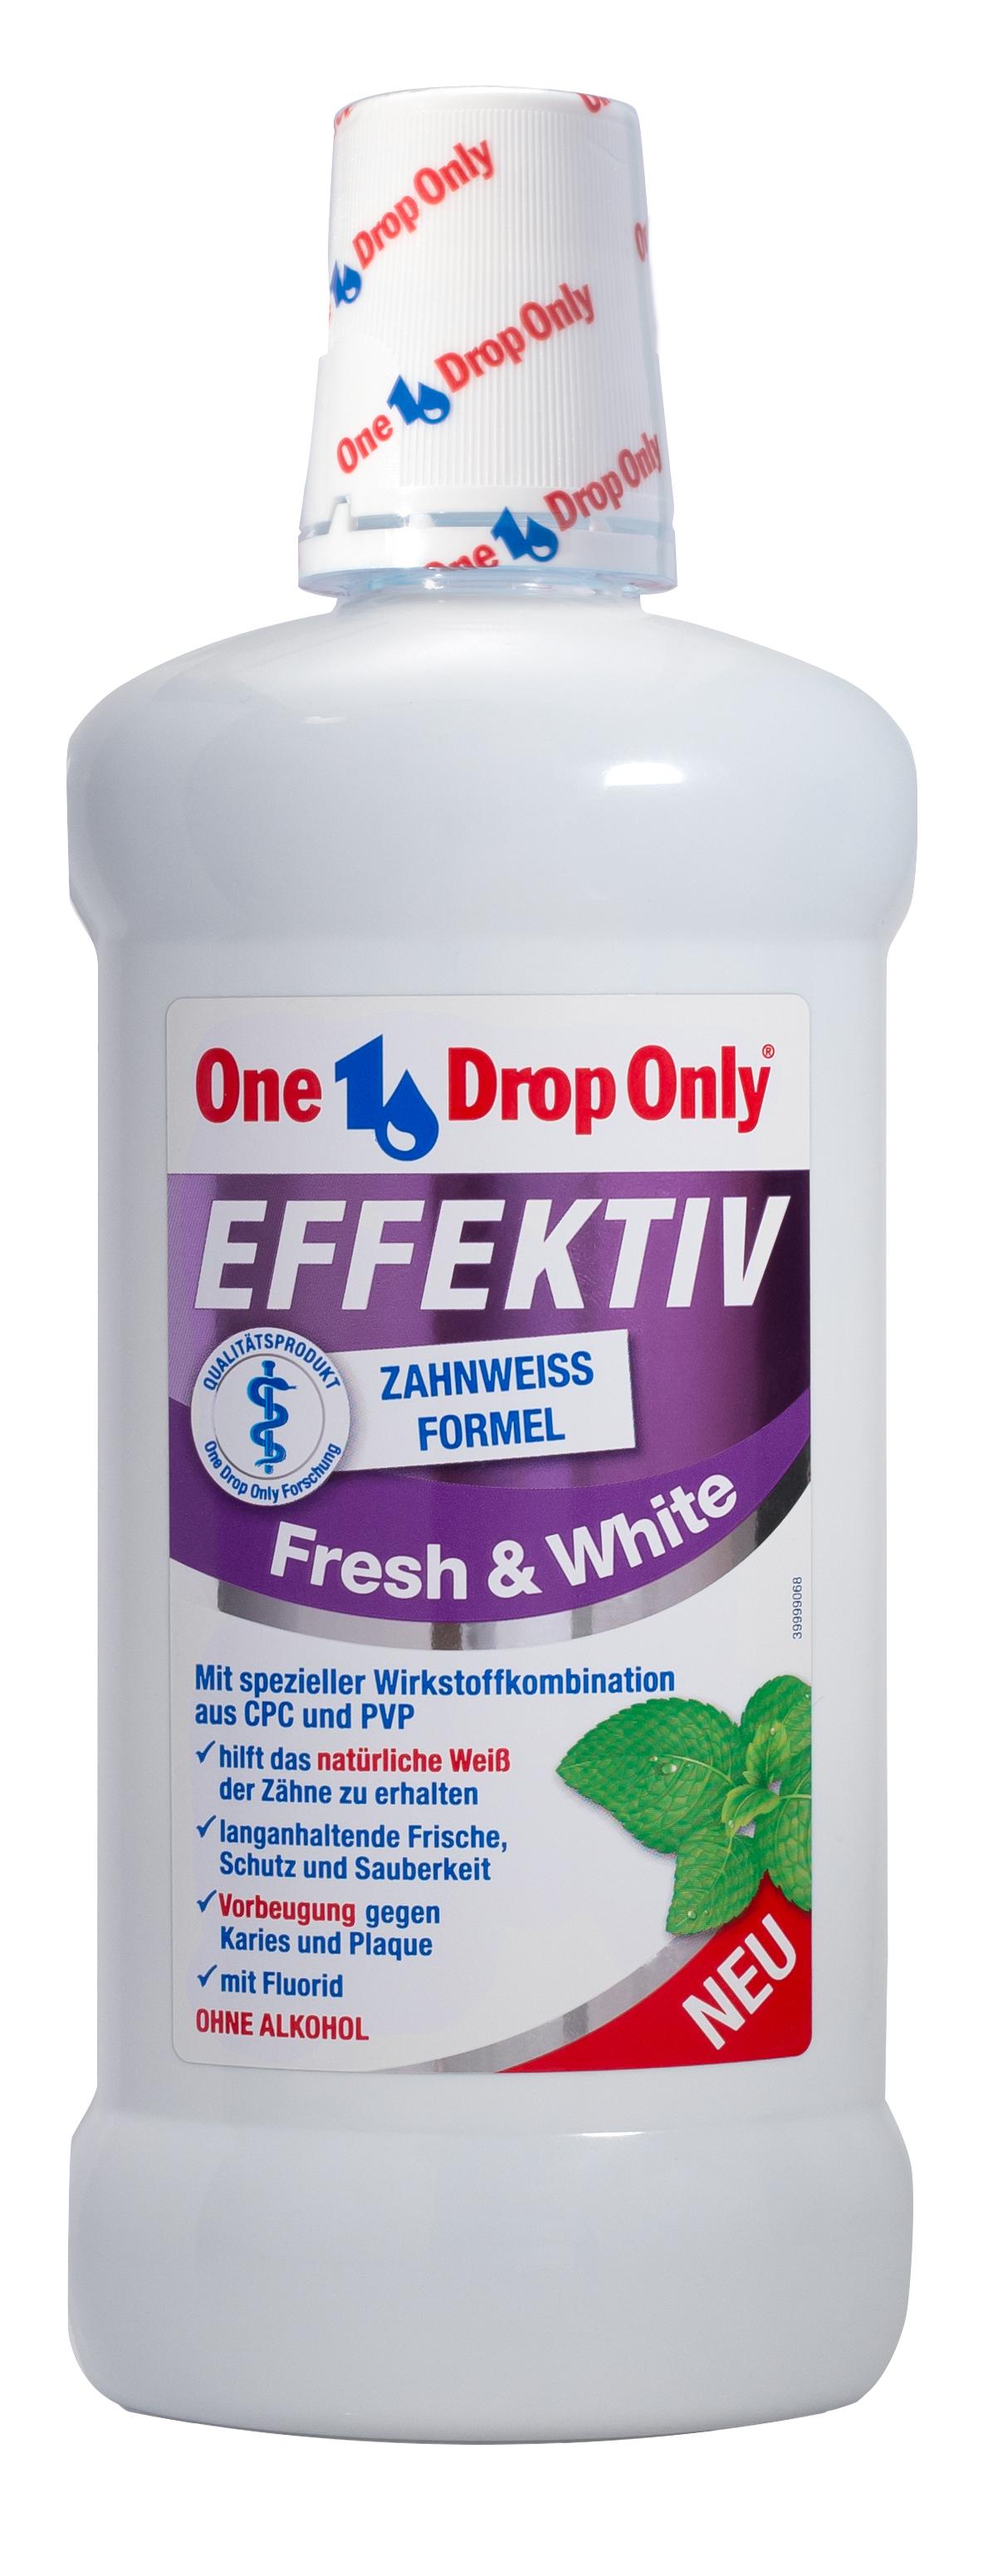 One Drop Only Effektiv Fresh&White Антибактериальный ополаскиватель полости рта, 500 мл only on380ewogp68